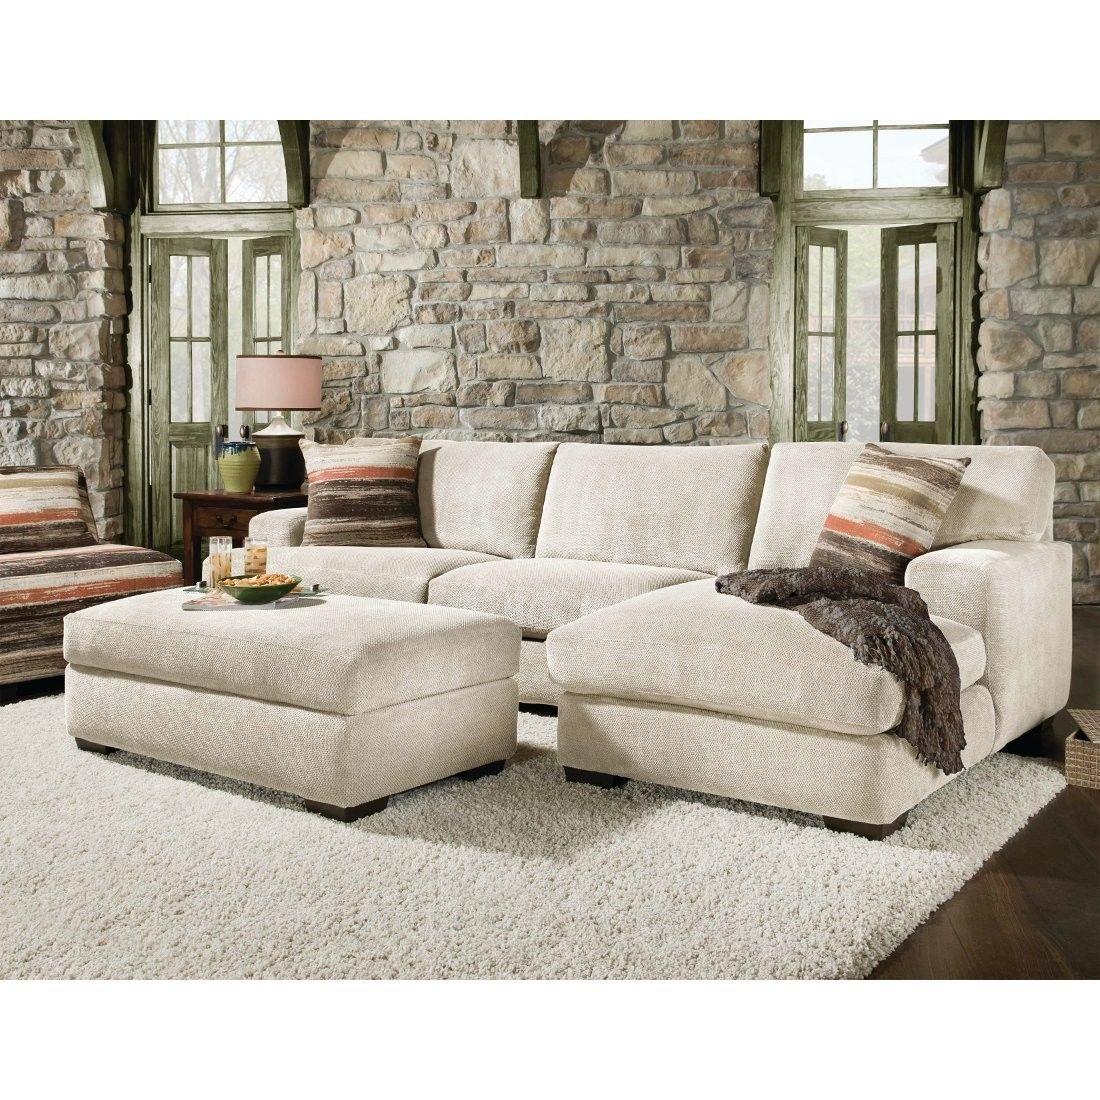 Corinthian Mead Sectional Sofa Piece Cream 48a3lf Conn S